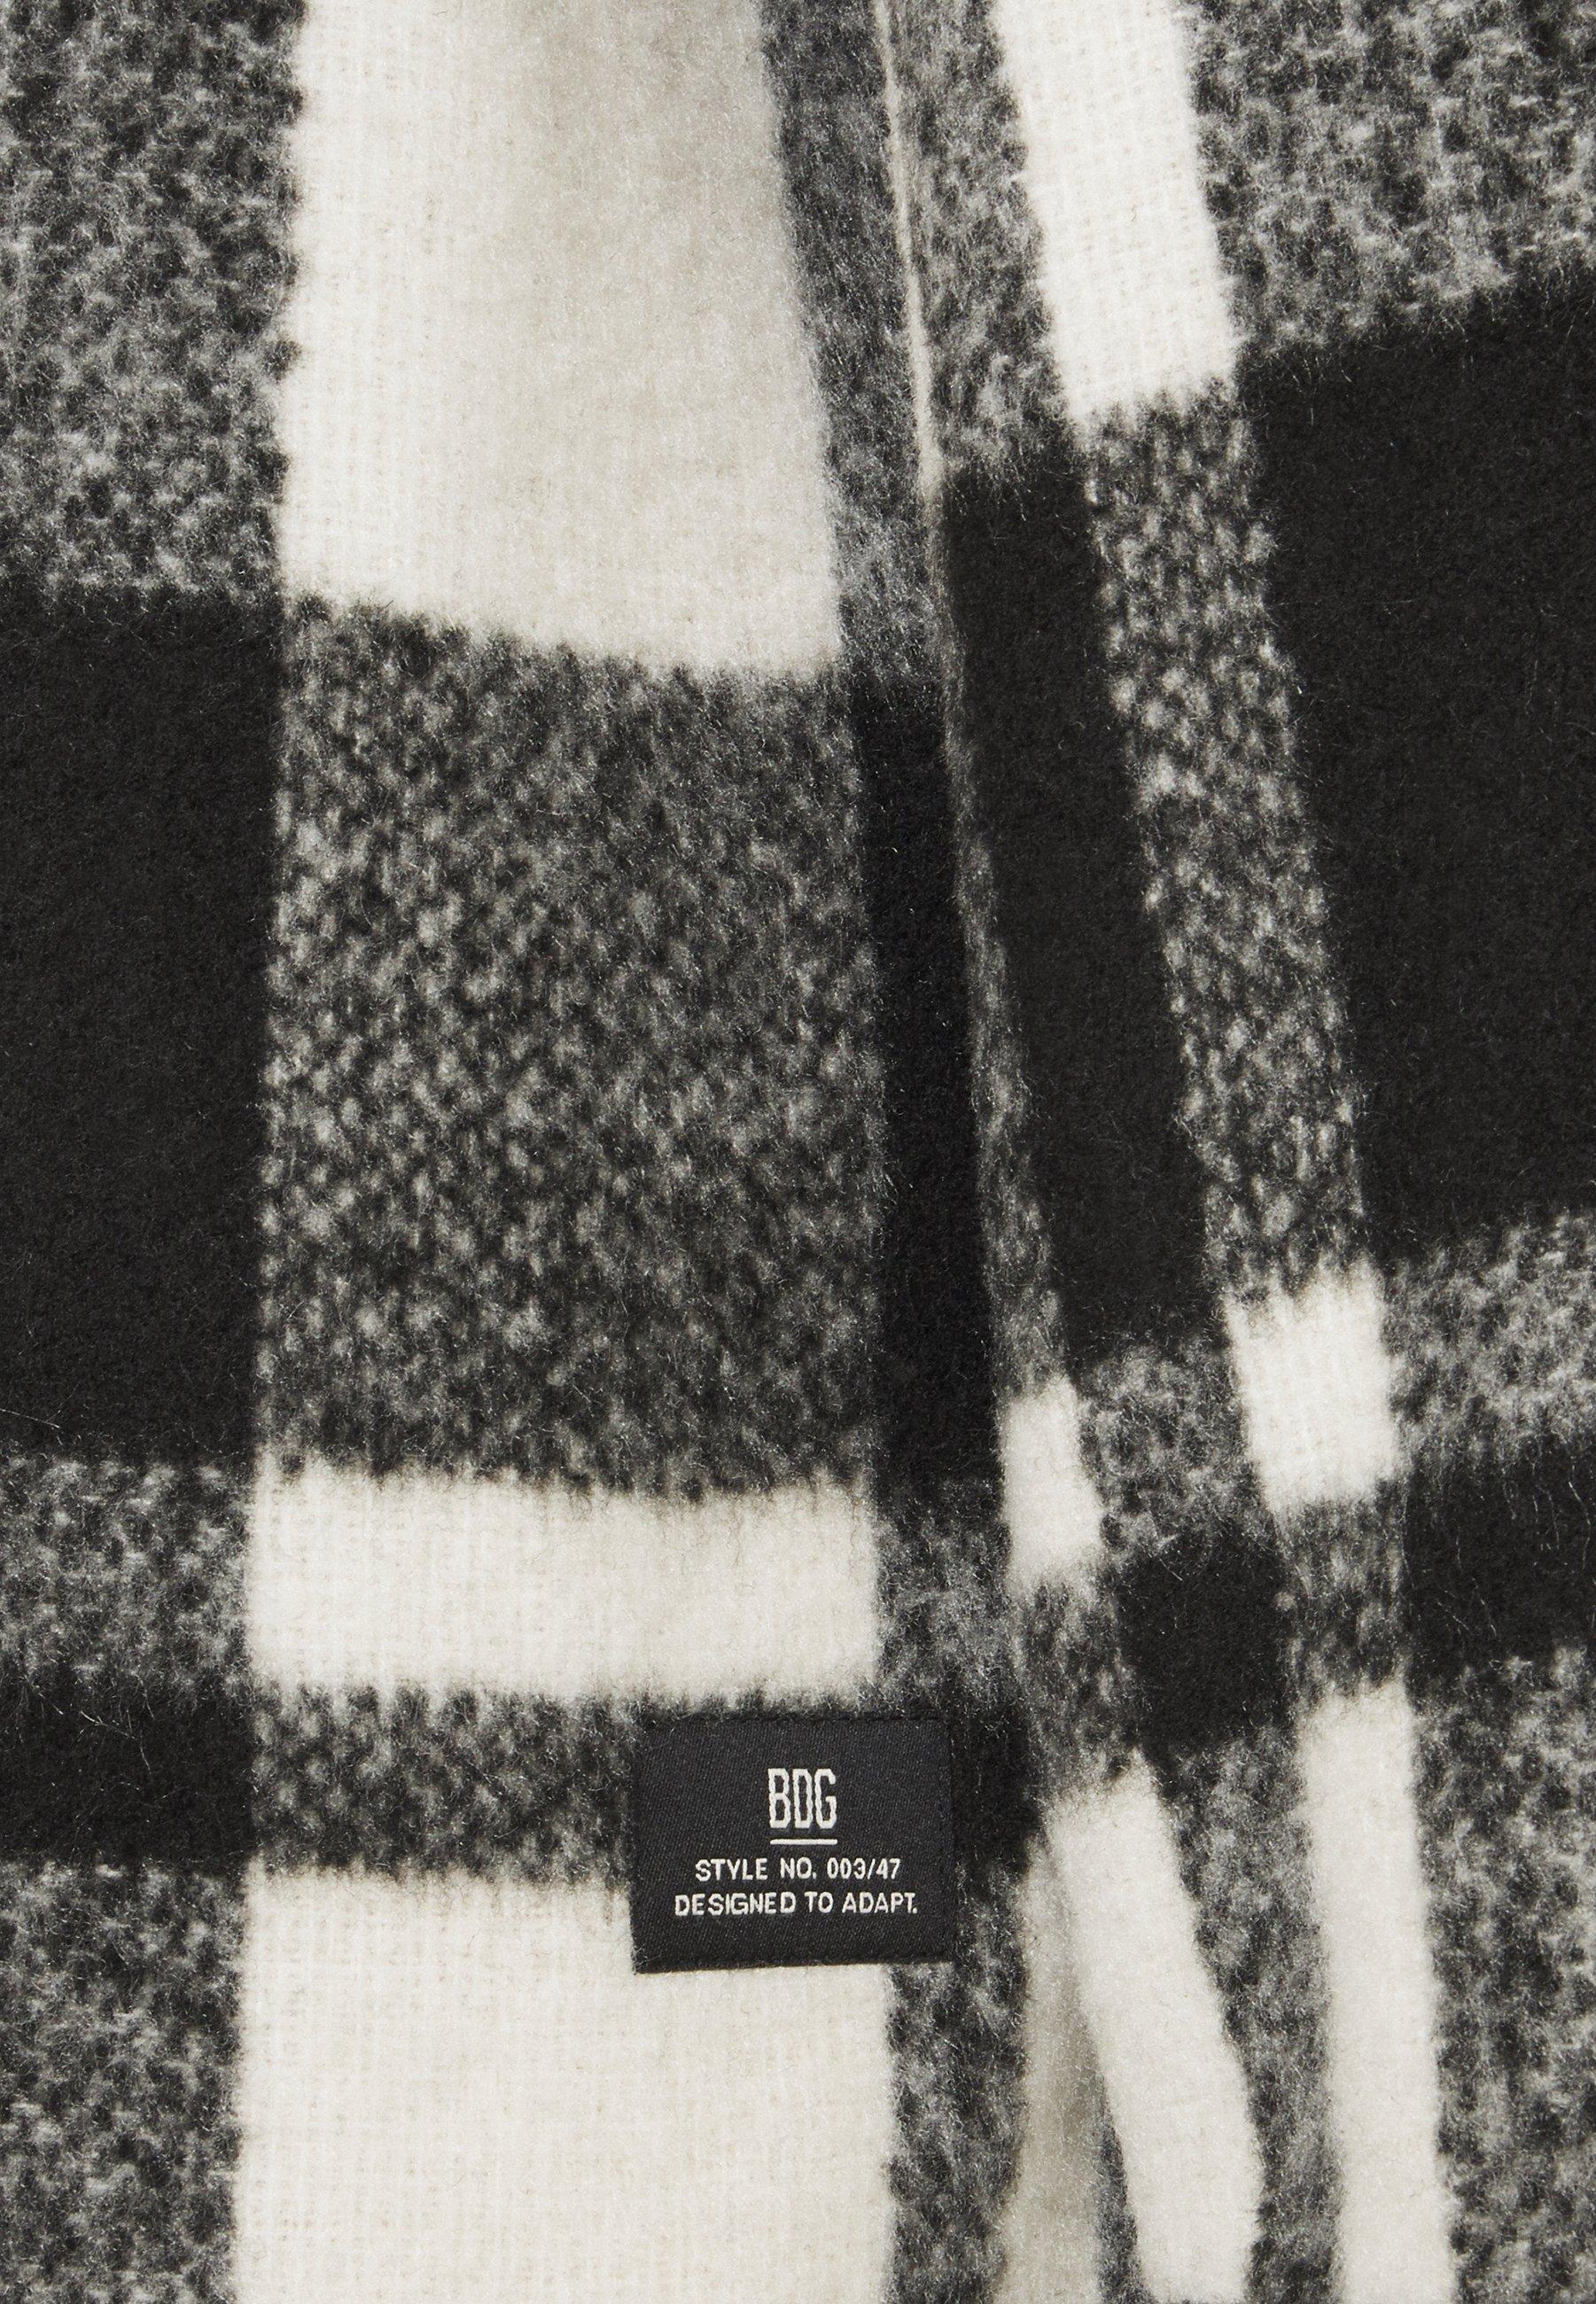 BDG Urban Outfitters CHECK JACKET Leichte Jacke black/white/schwarz